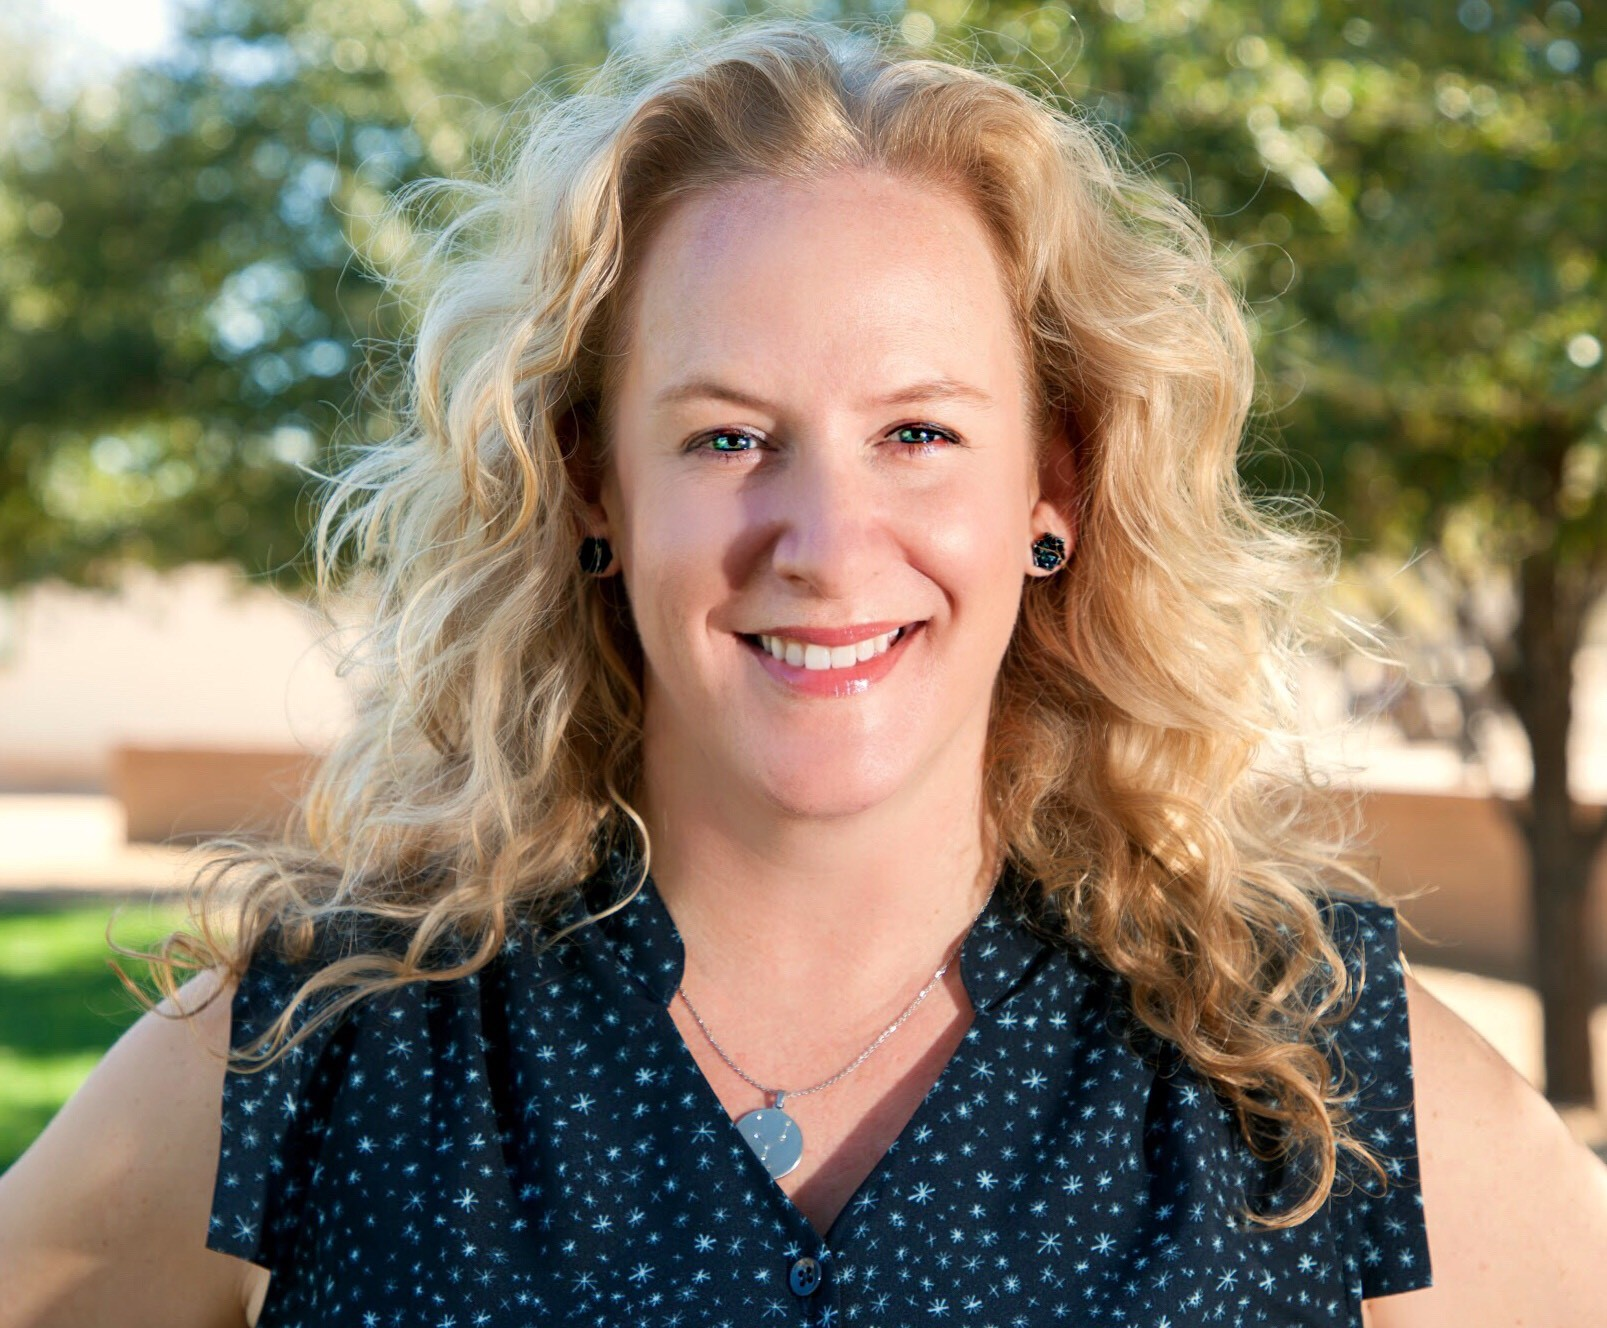 Meredith Lipscomb